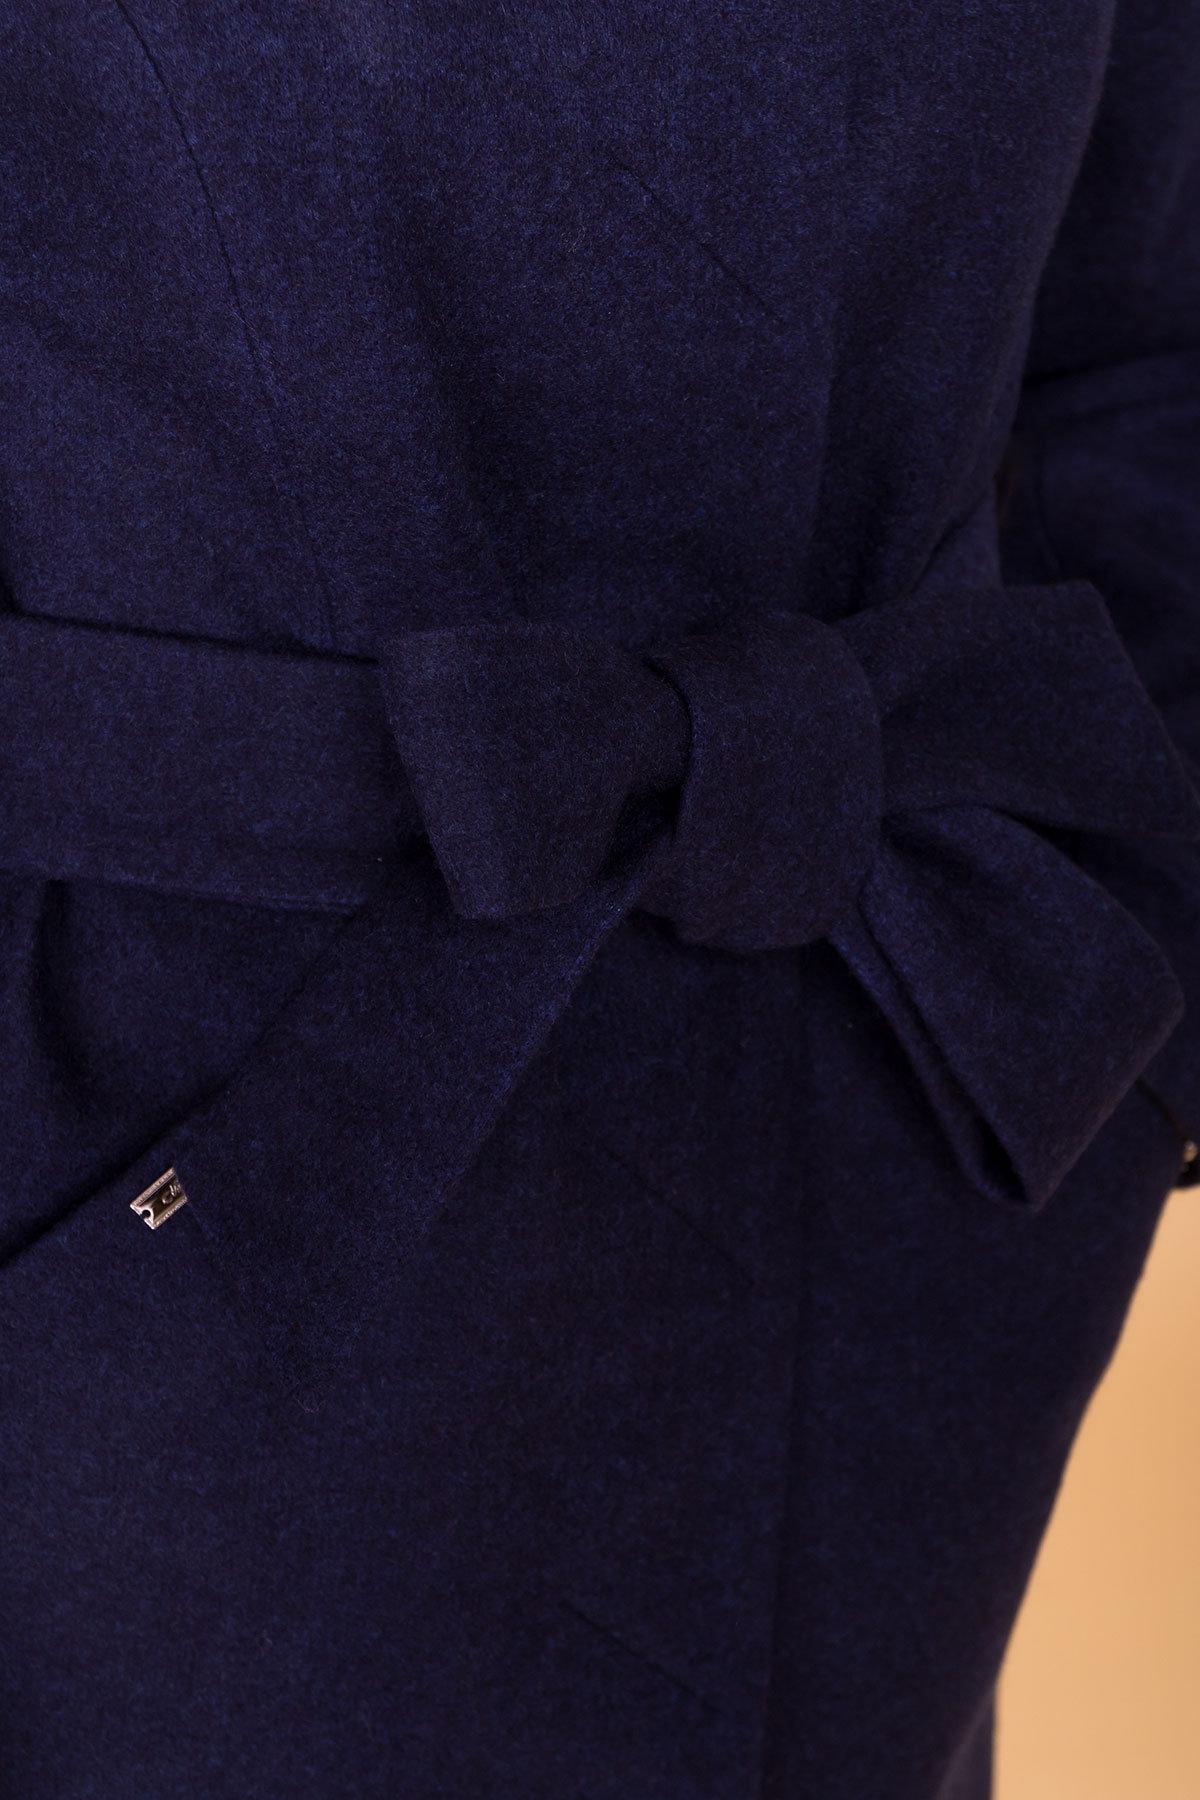 Пальто Сплит 4374 АРТ. 37660 Цвет: Темно-синий 17 - фото 6, интернет магазин tm-modus.ru